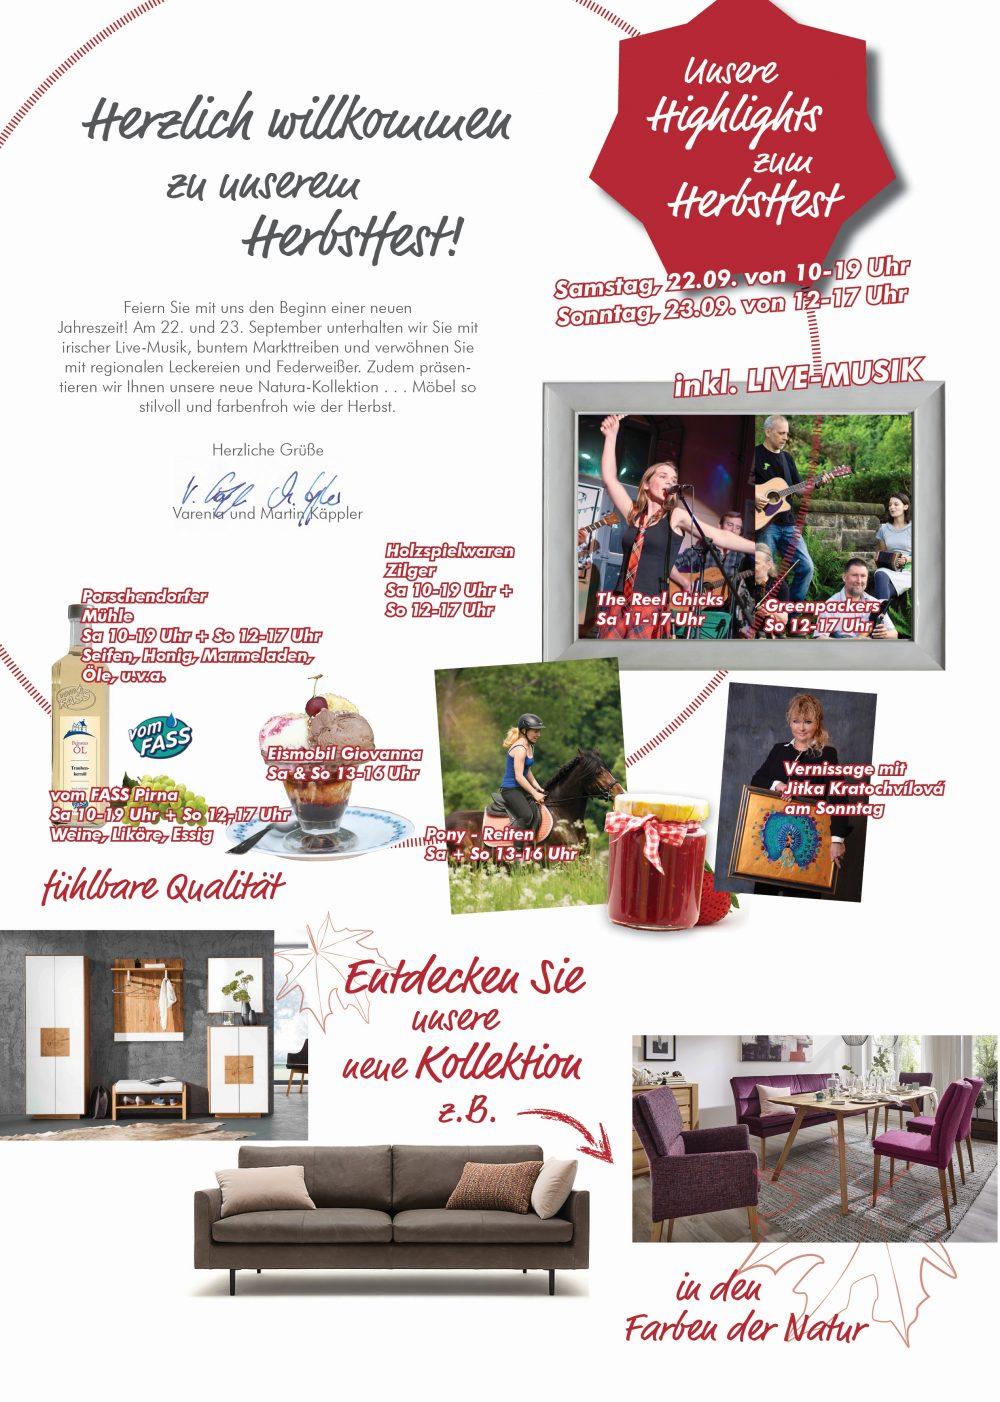 Herbstfest Mit Live Musik Am 2223 September Käppler